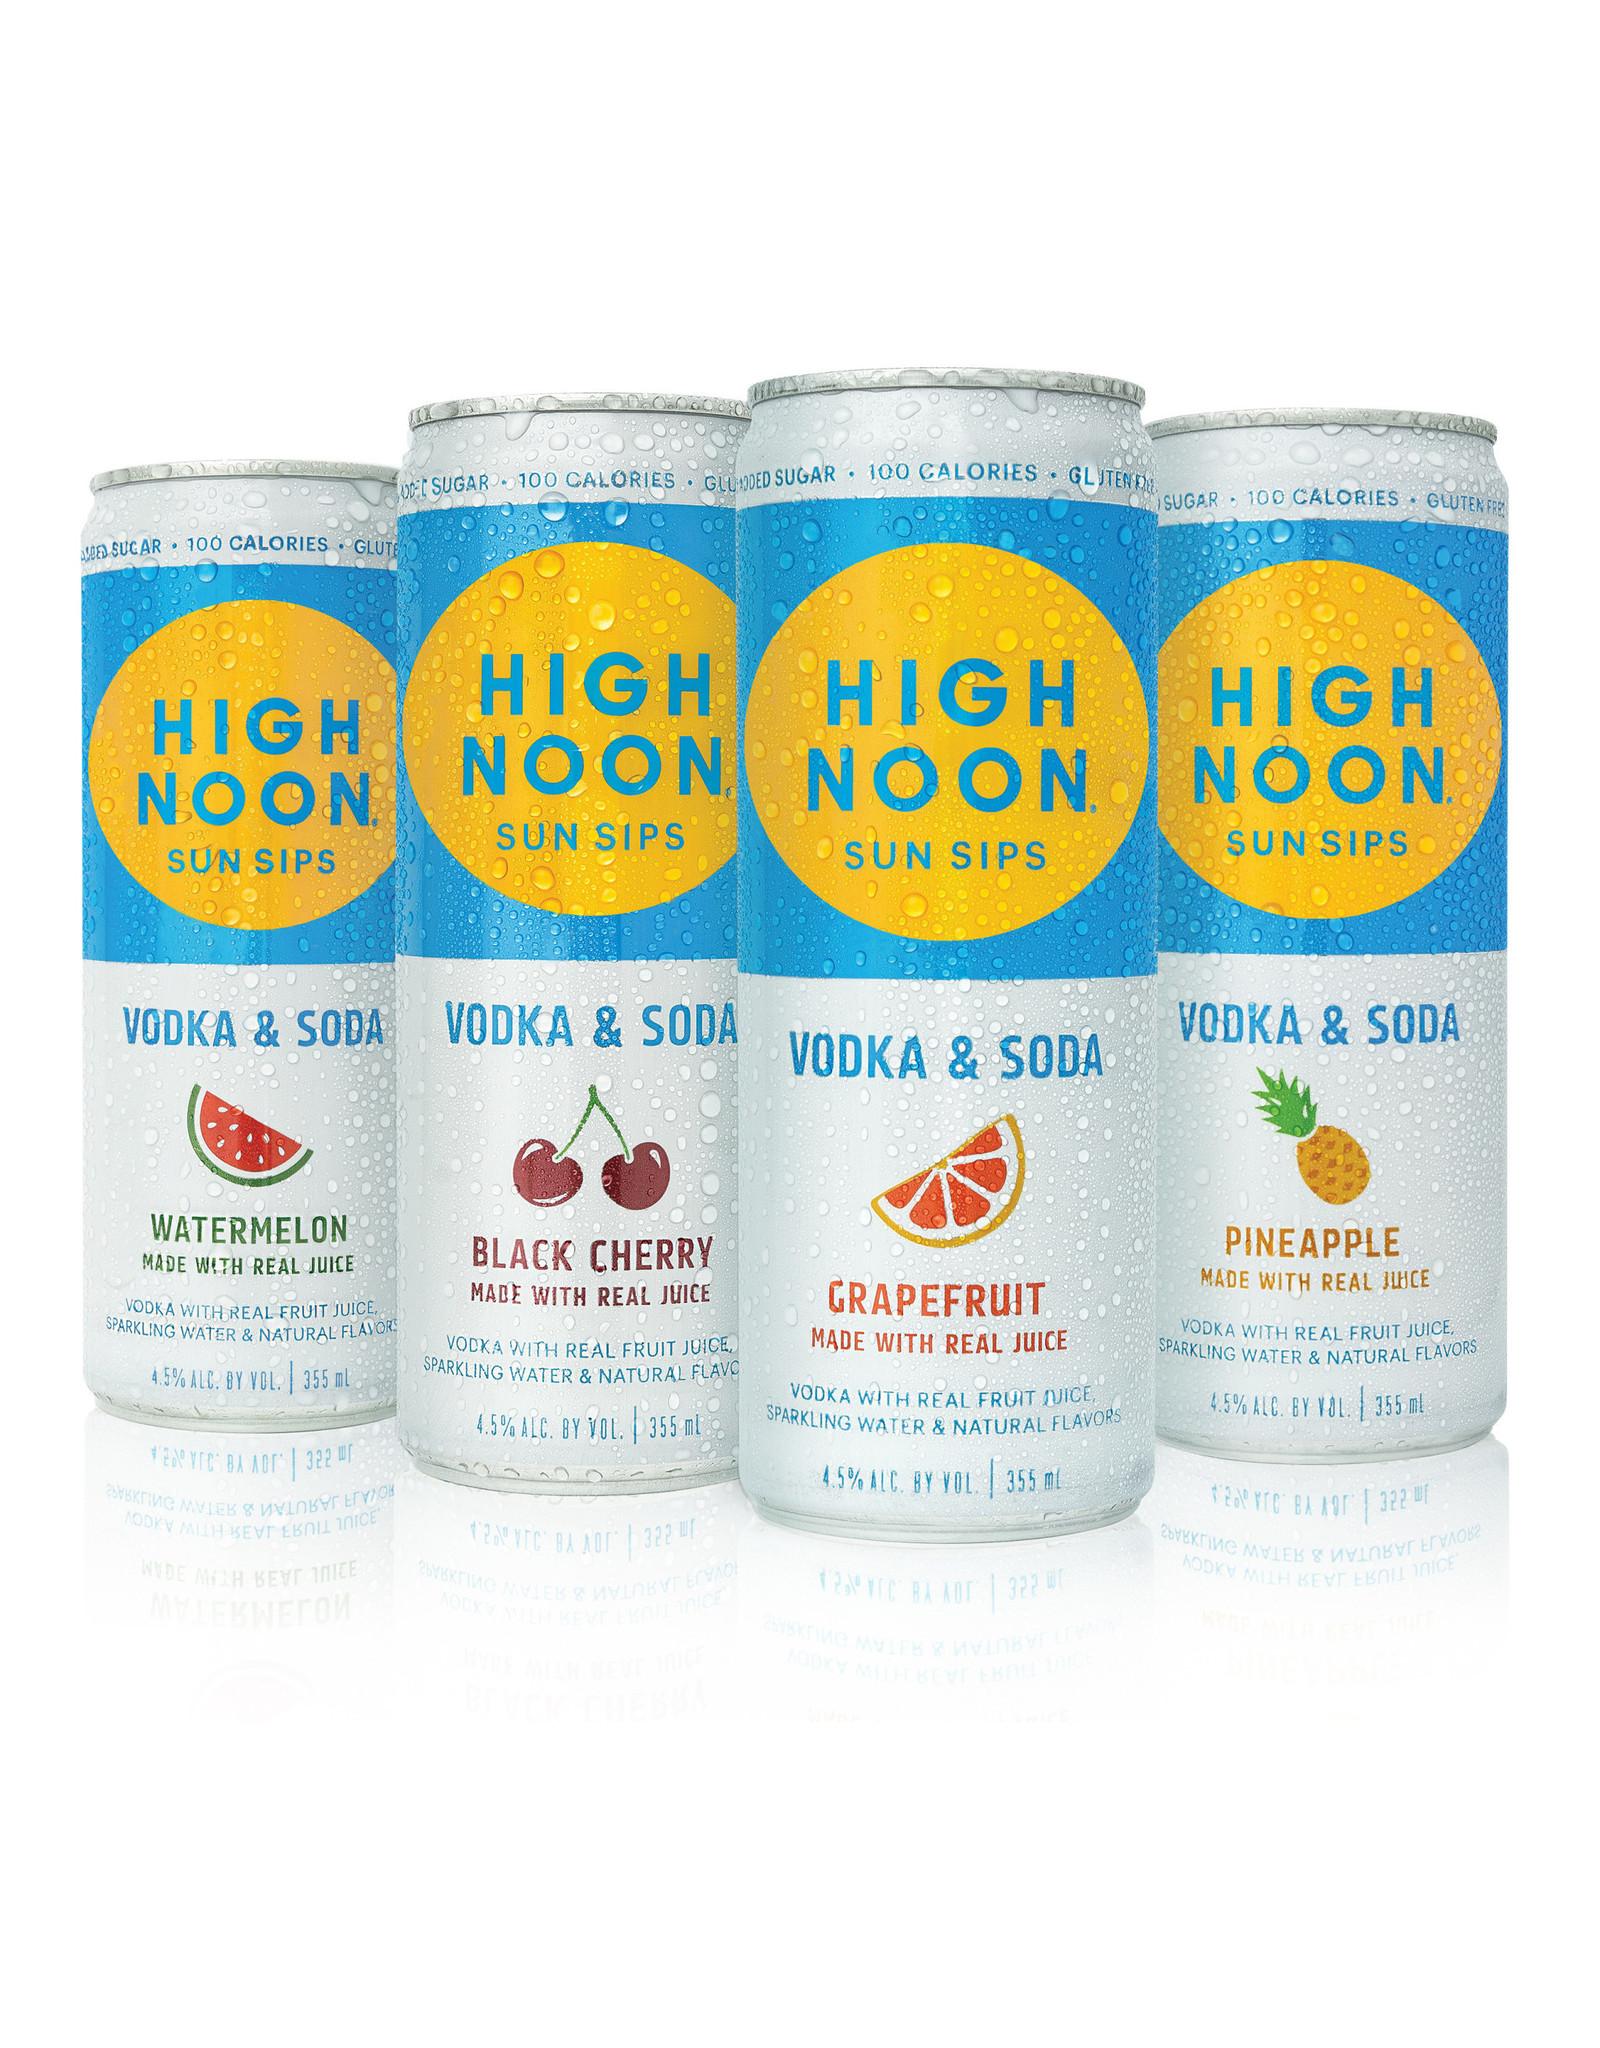 High Noon singles